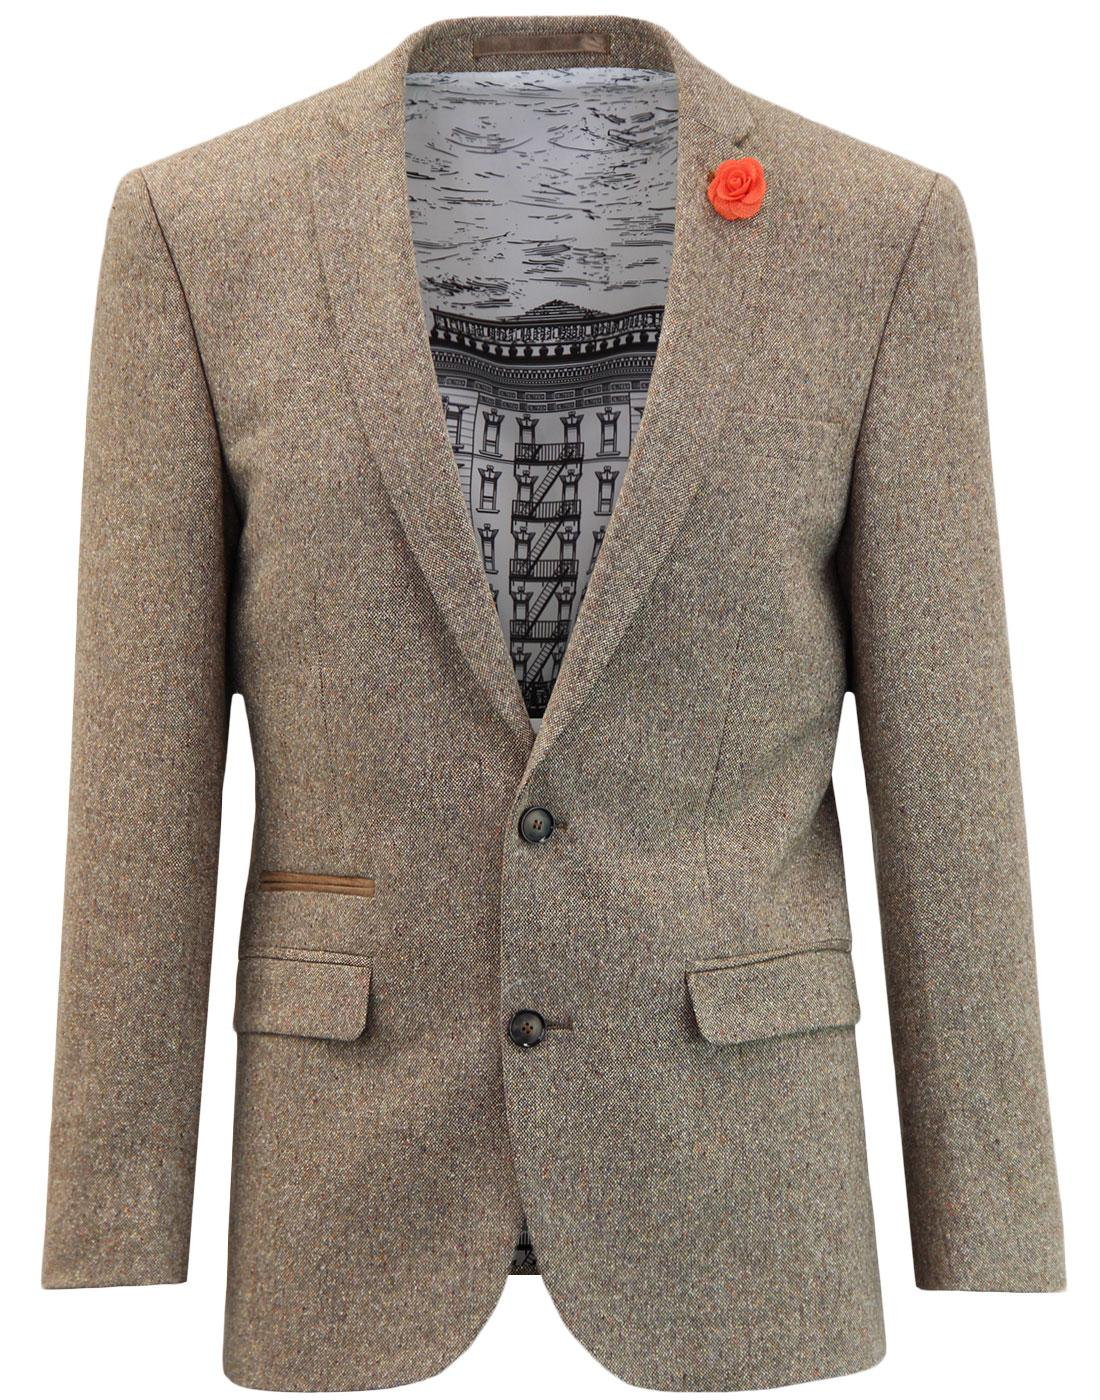 60s Mod Donegal Fleck 2 Button Suit Jacket BISCUIT